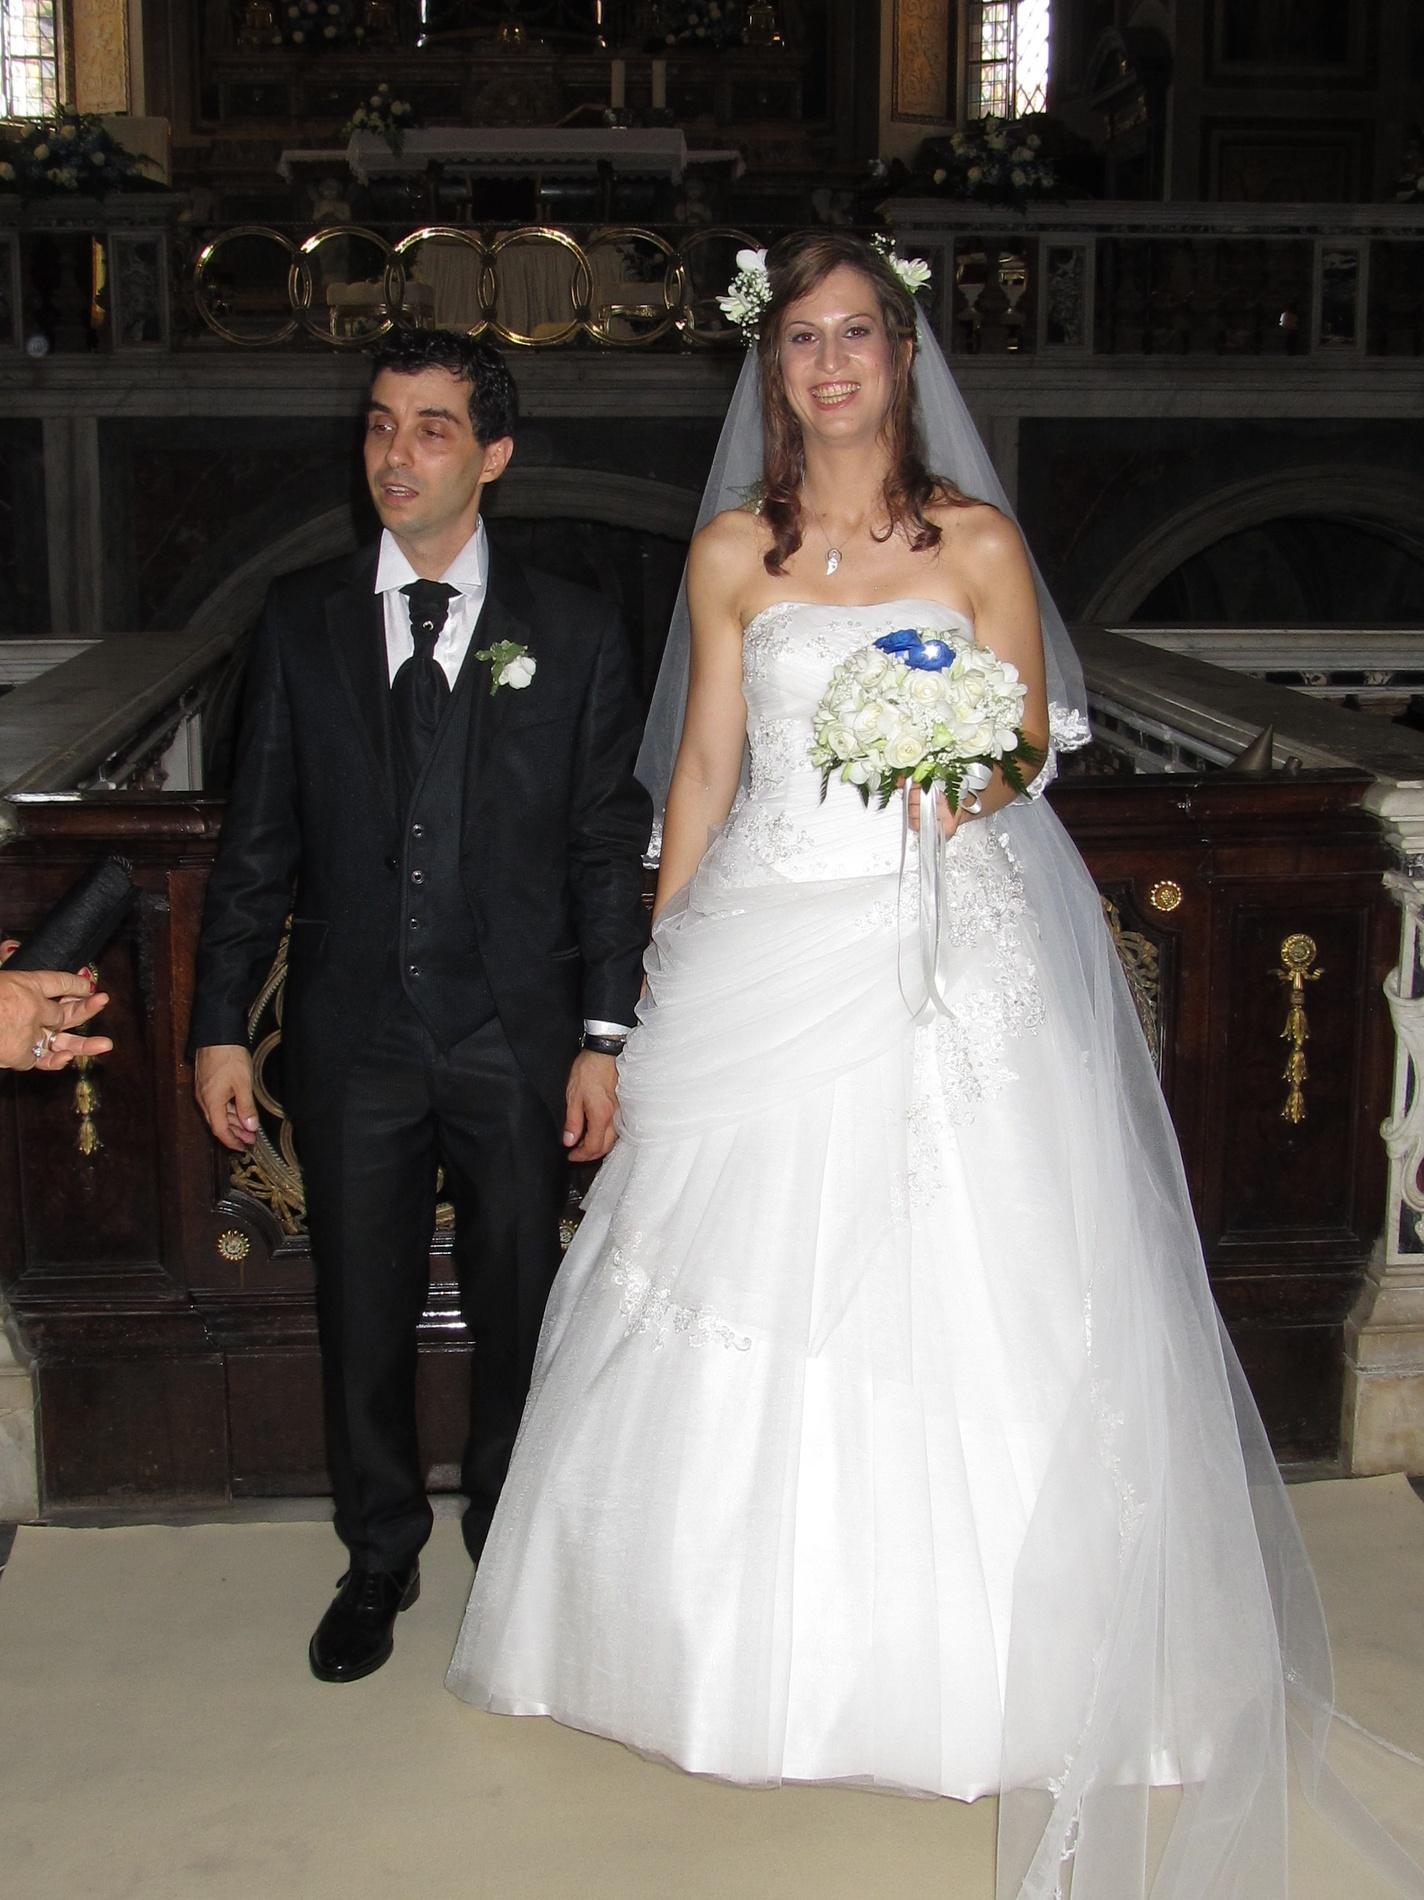 matrimonio-ilaria-torrisi-e-marco-di-lucia-2015-08-08-16-49-29